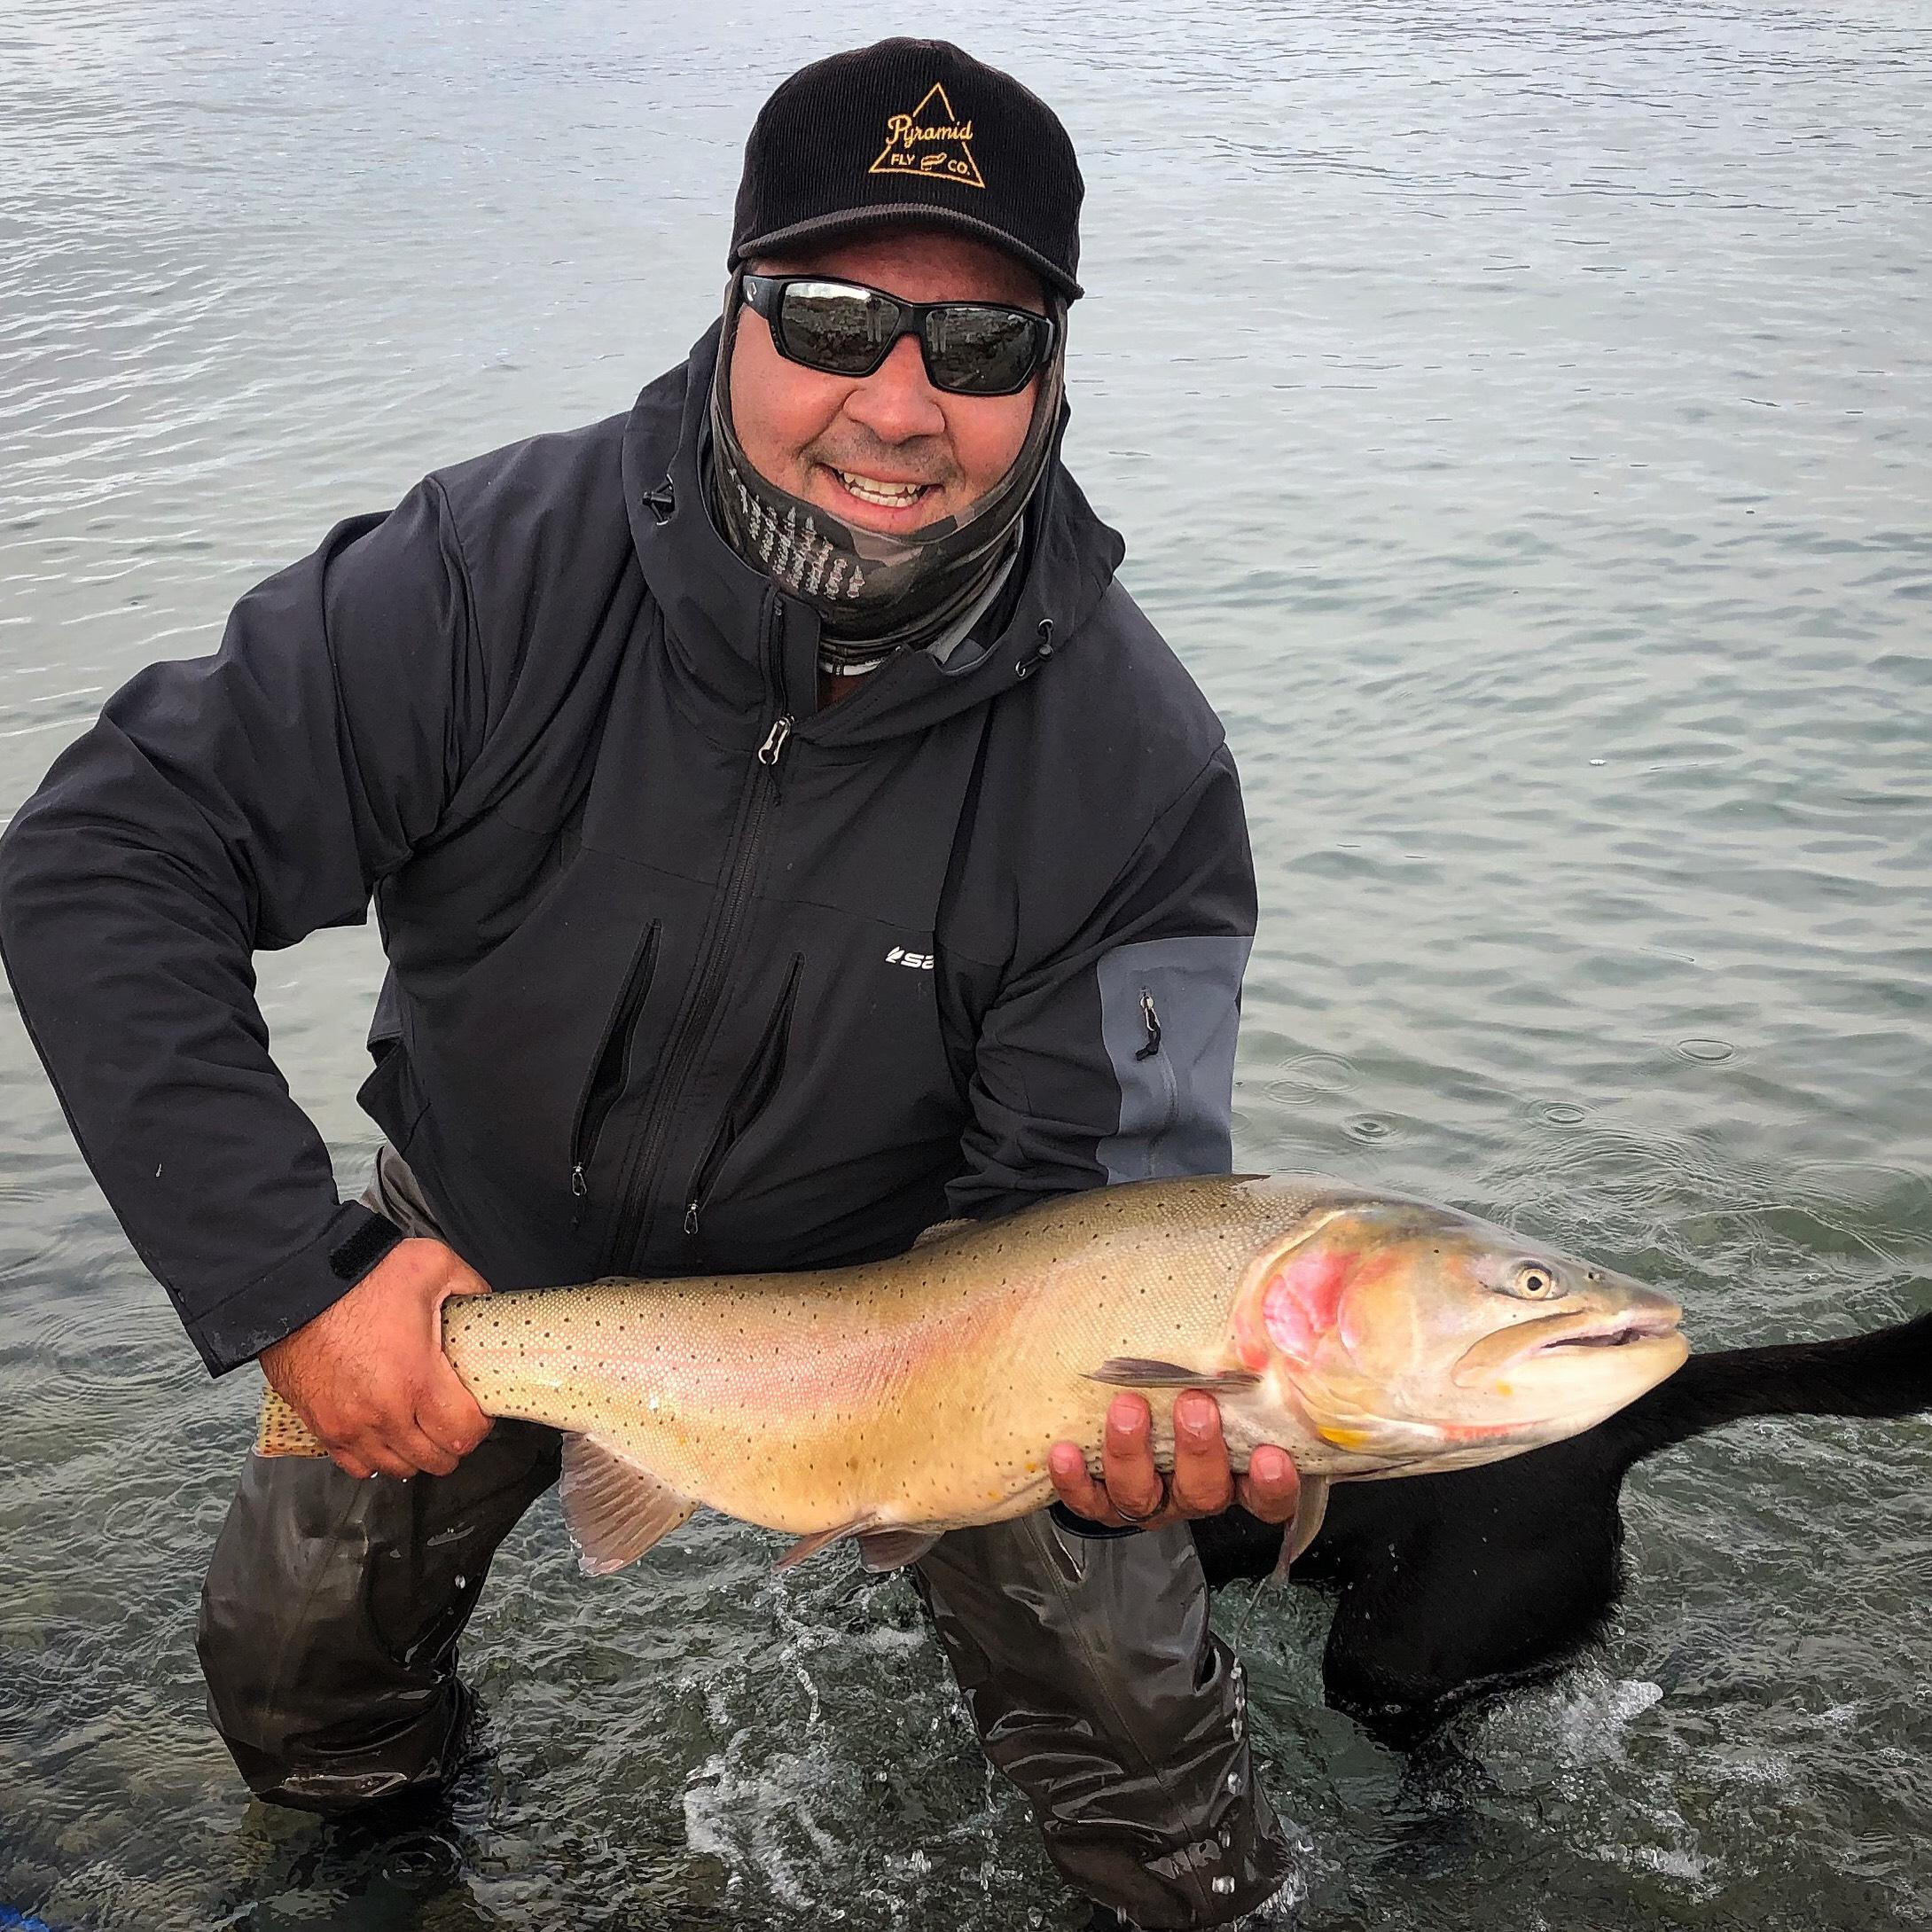 David Briseno got in on the big fish action this week.                                Photo: Morgan Kane